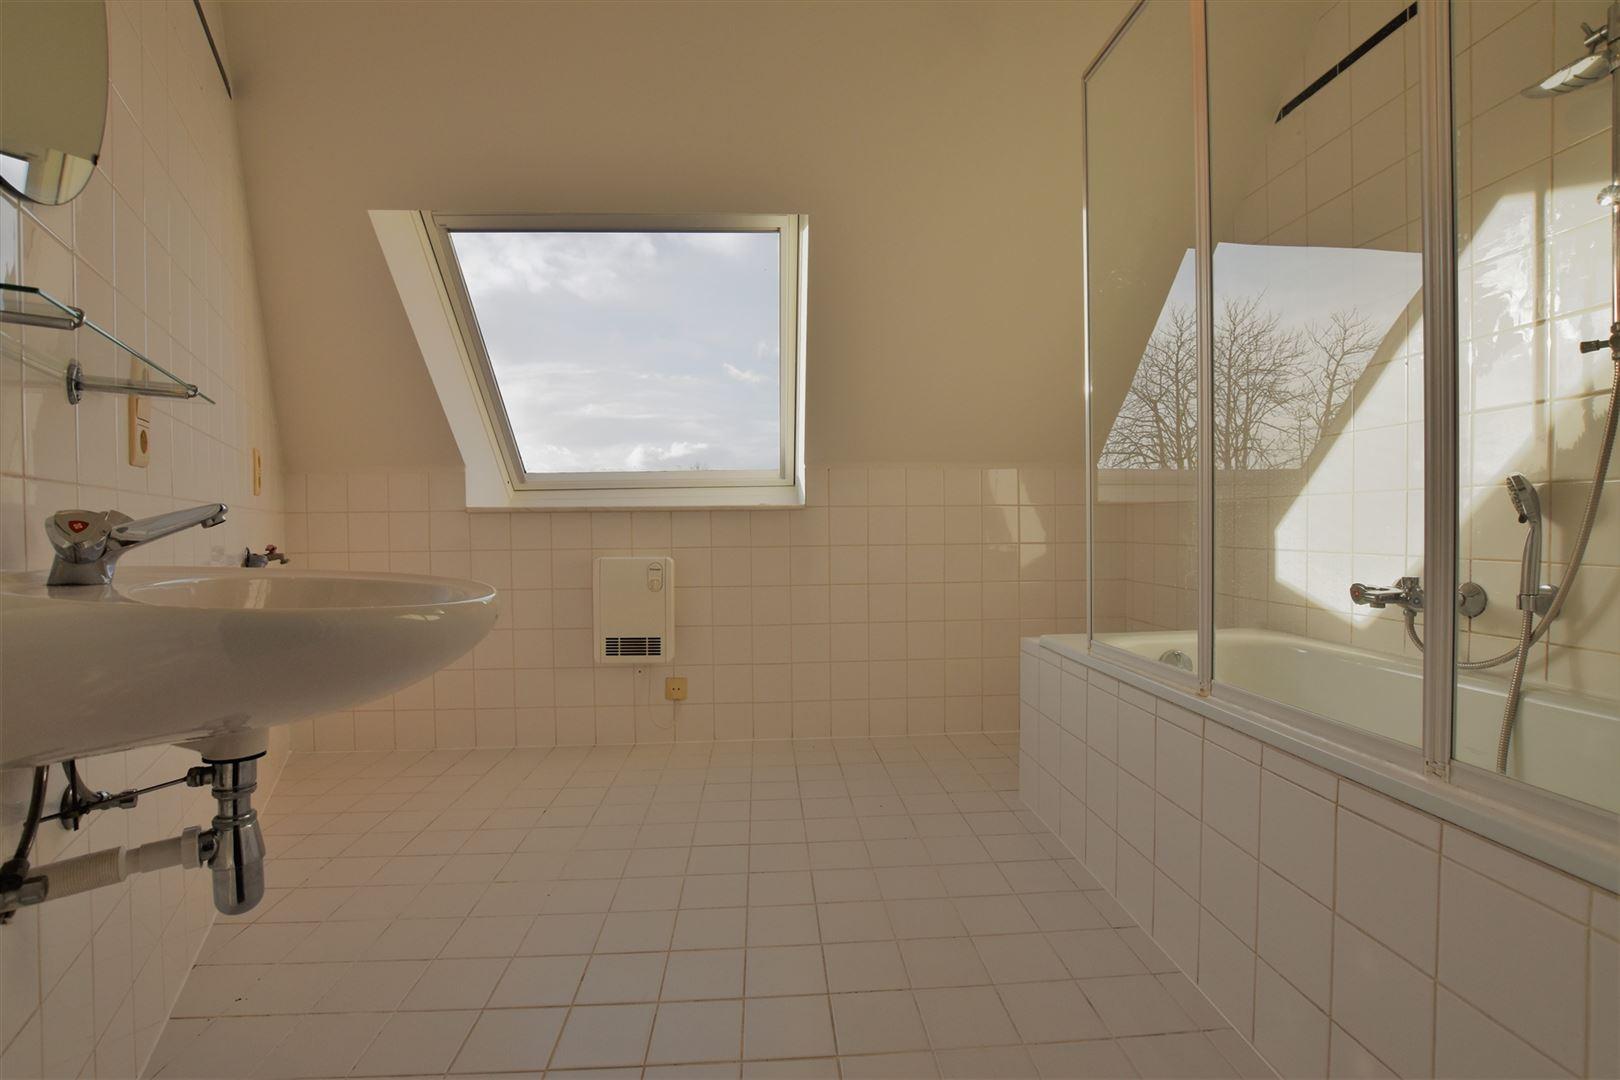 Foto 14 : Appartement te 9280 Lebbeke (België) - Prijs € 645